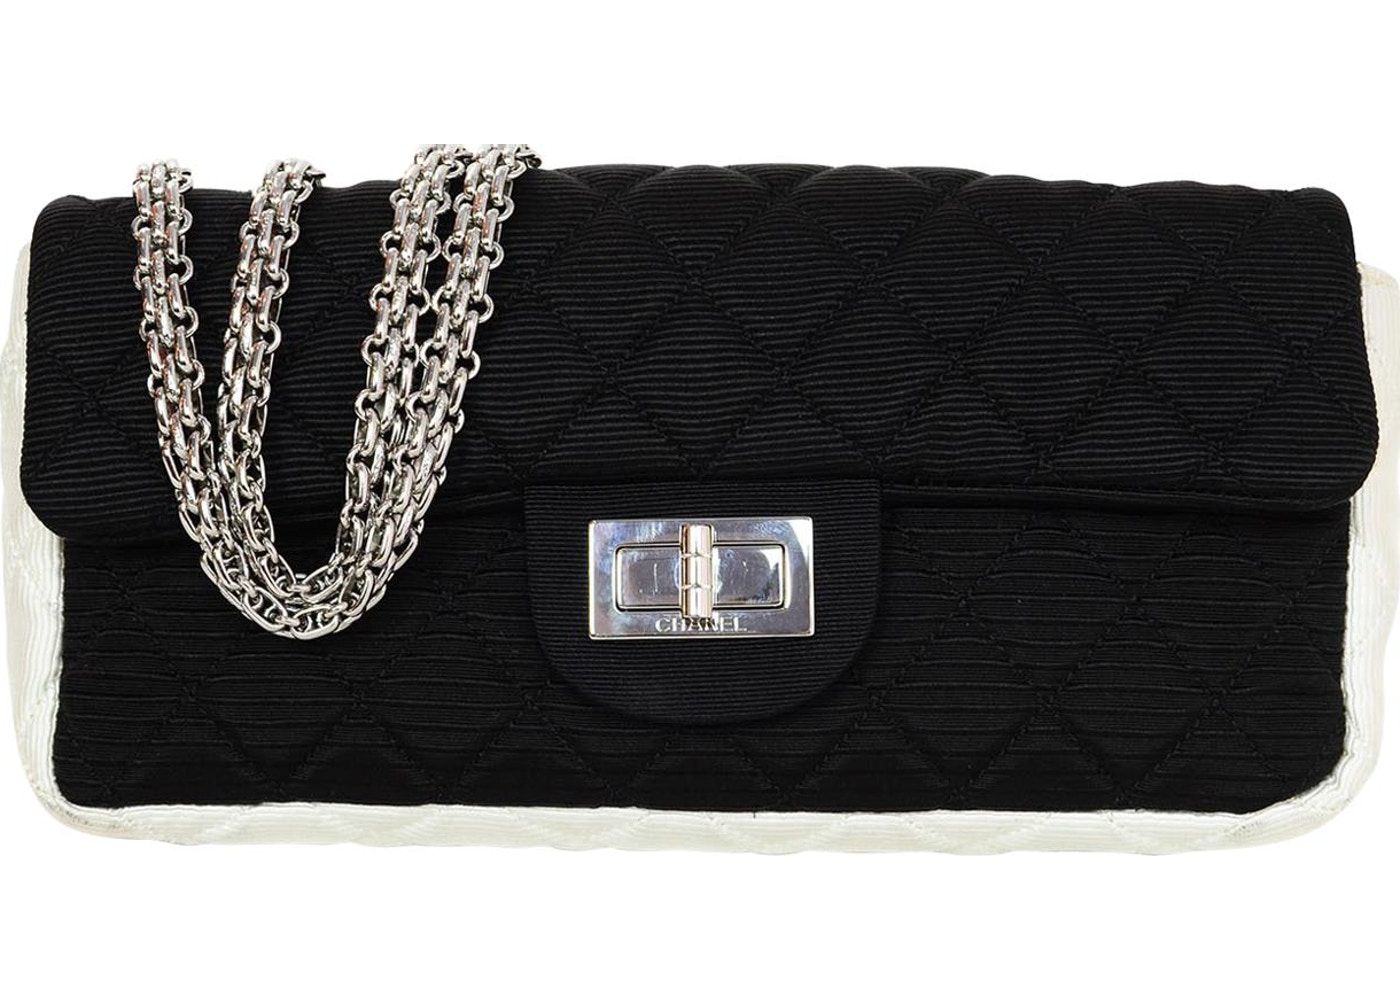 0e2b47fd68d7 Chanel Reissue East West Flap Bag Quilted Grosgrain Black/White. Quilted  Grosgrain Black/White